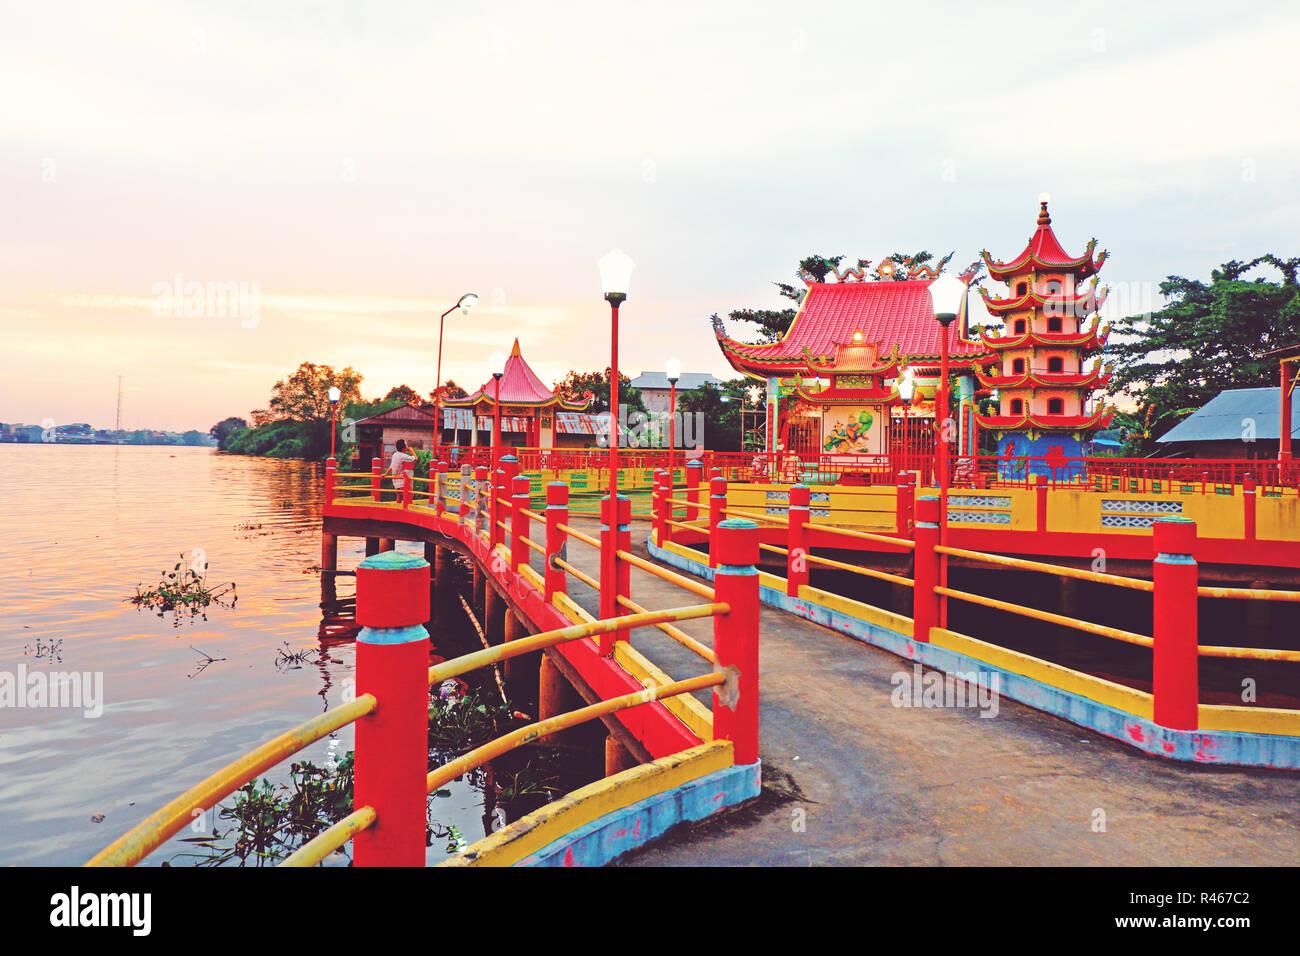 chinese temple in sambas regency, west kalimantan, indonesia - Stock Image